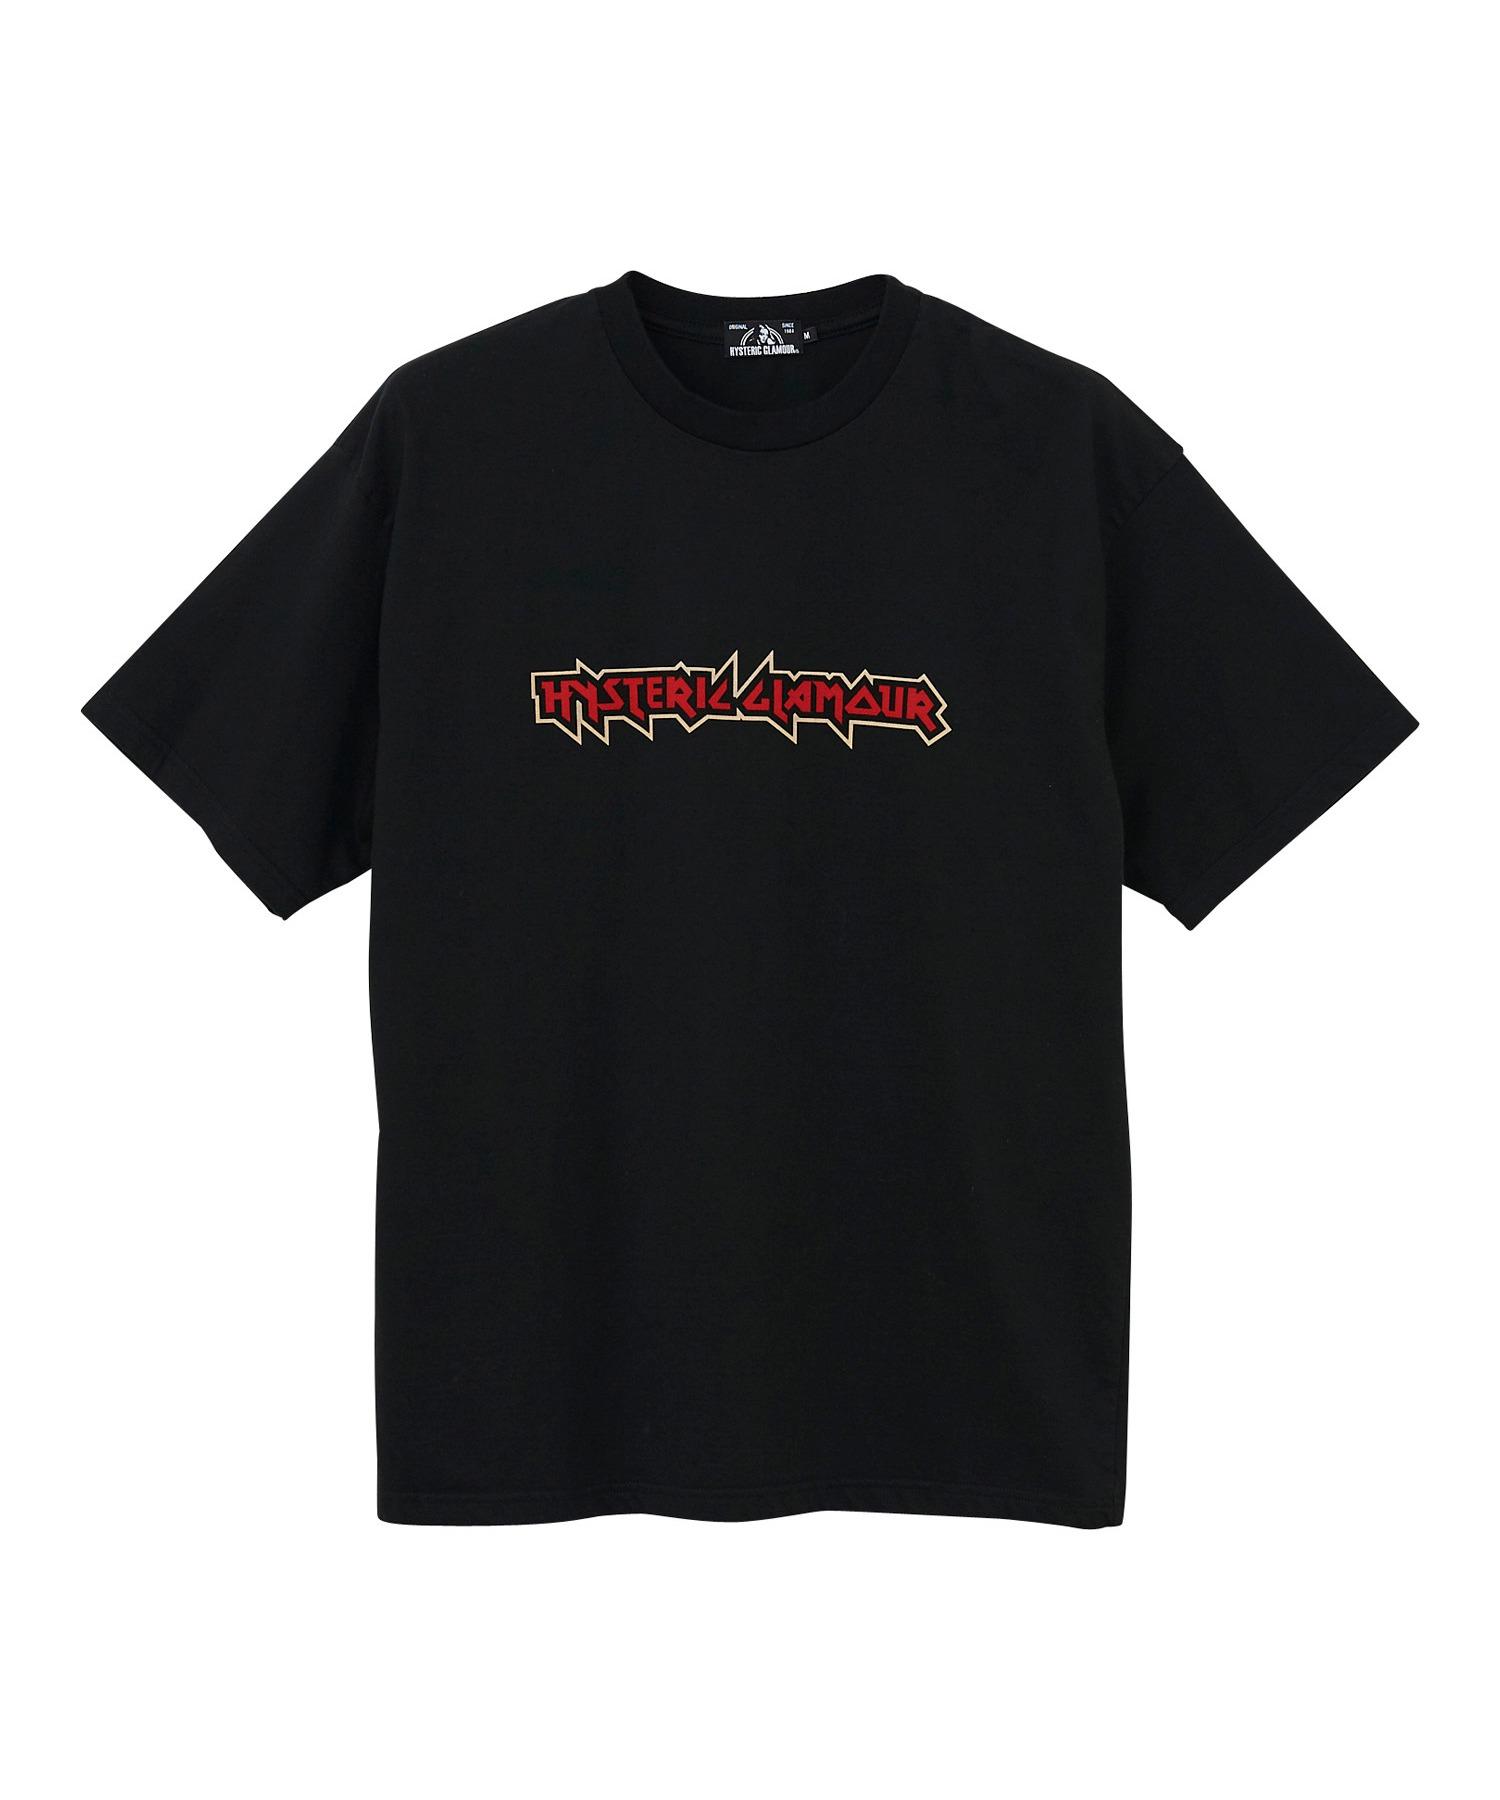 METAL LOGO Tシャツ